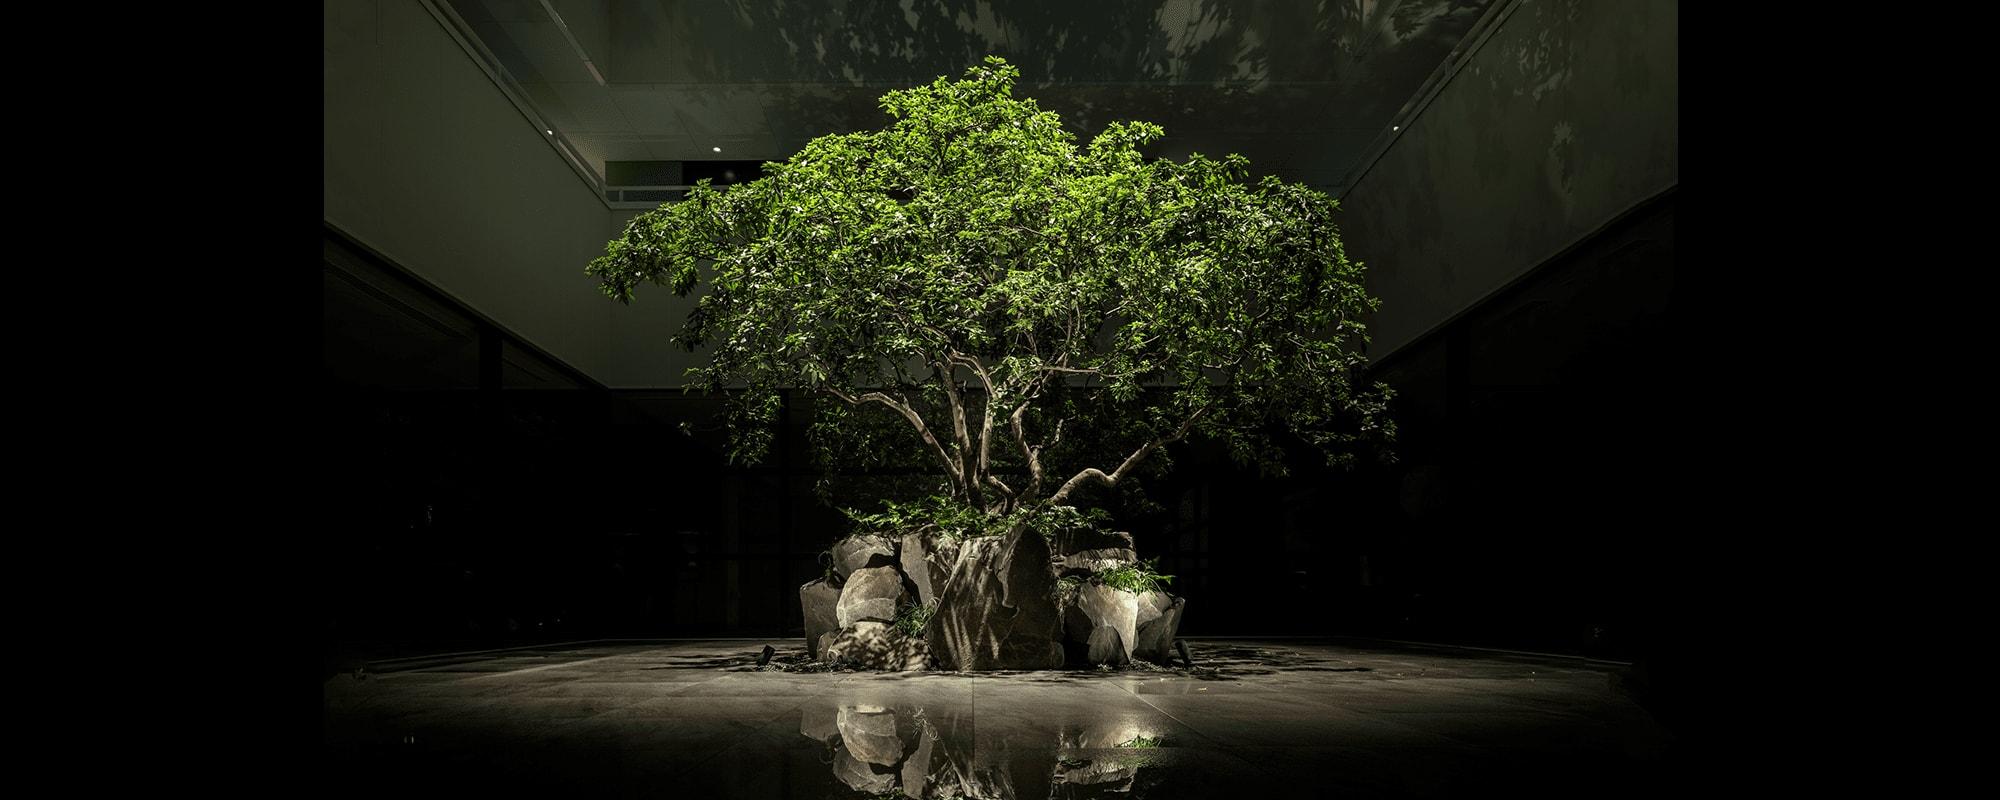 「THE GENERAL KYOTO Takatsuji Tominokoji  ザジェネラルキョウト高辻富小路」(日本・京都)スイスのデザイングループ、アトリエ・オイが、日本で初めて手がけた空間デザインとインスタレーション